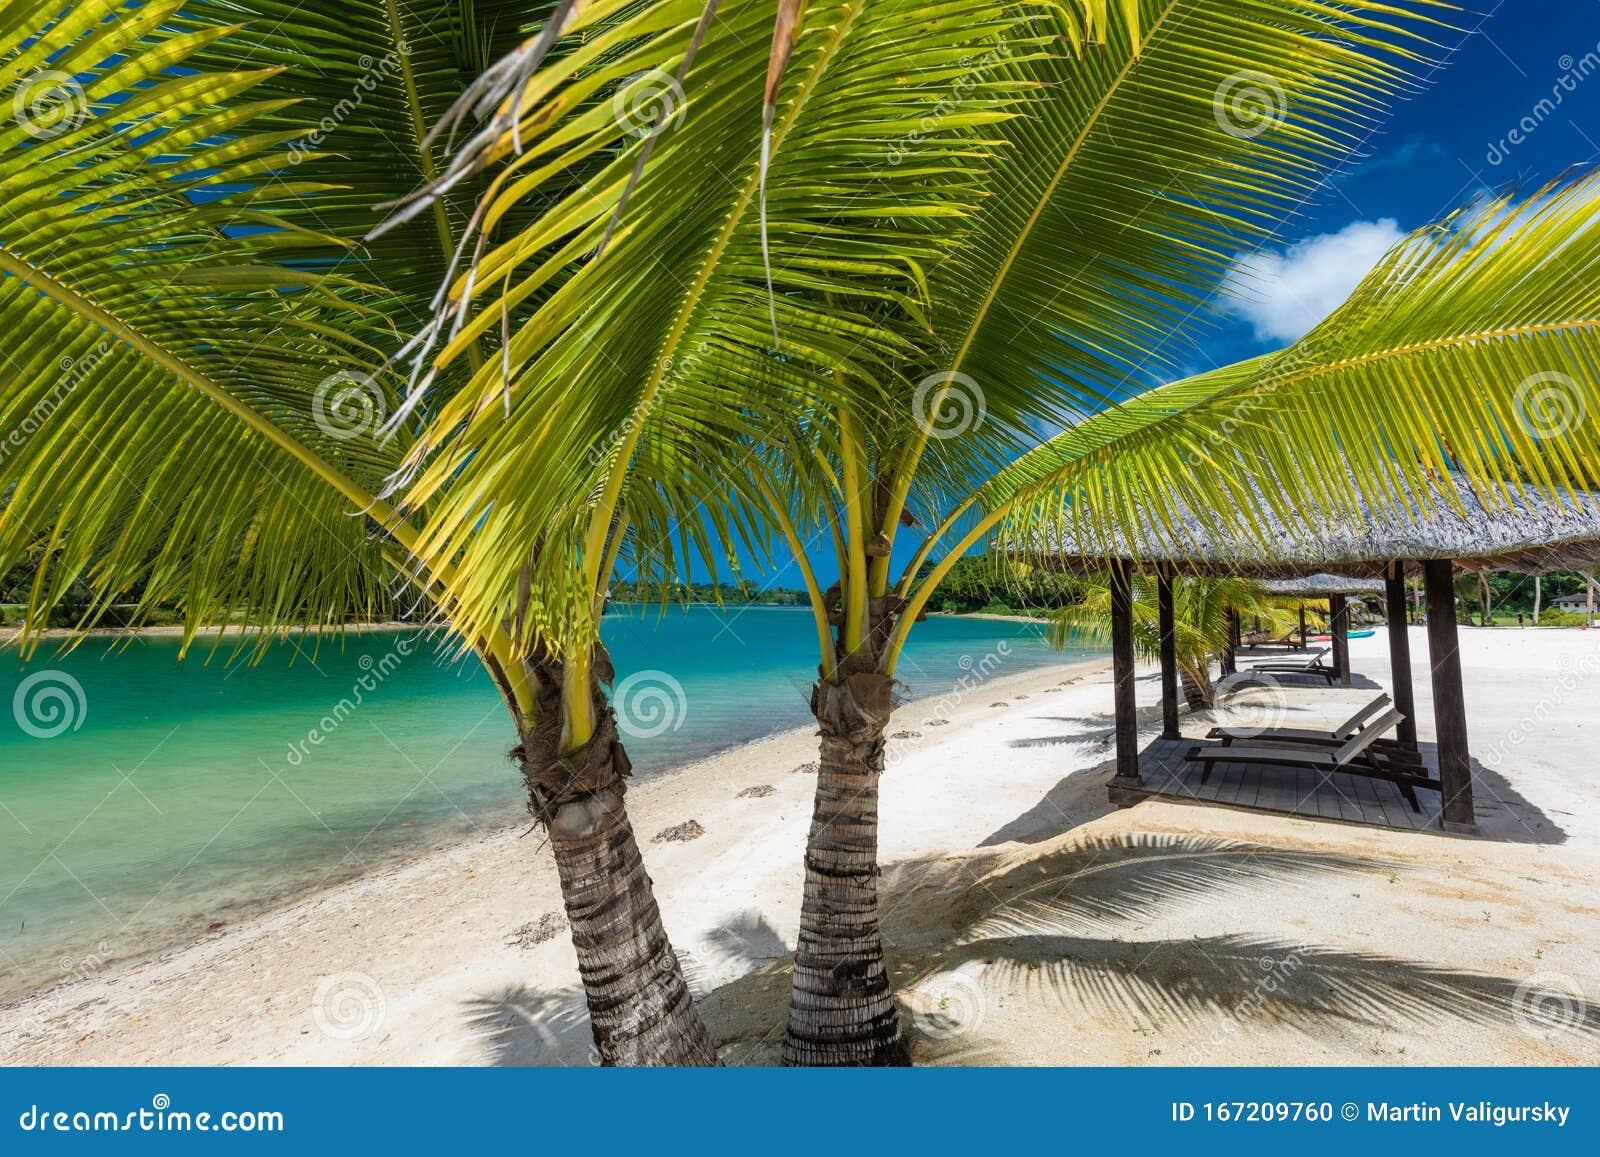 Tropical Resort Destination In Port Vila Efate Island Vanuatu Beach And Palm Trees Stock Photo Image Of Vila Gazebo 167209760